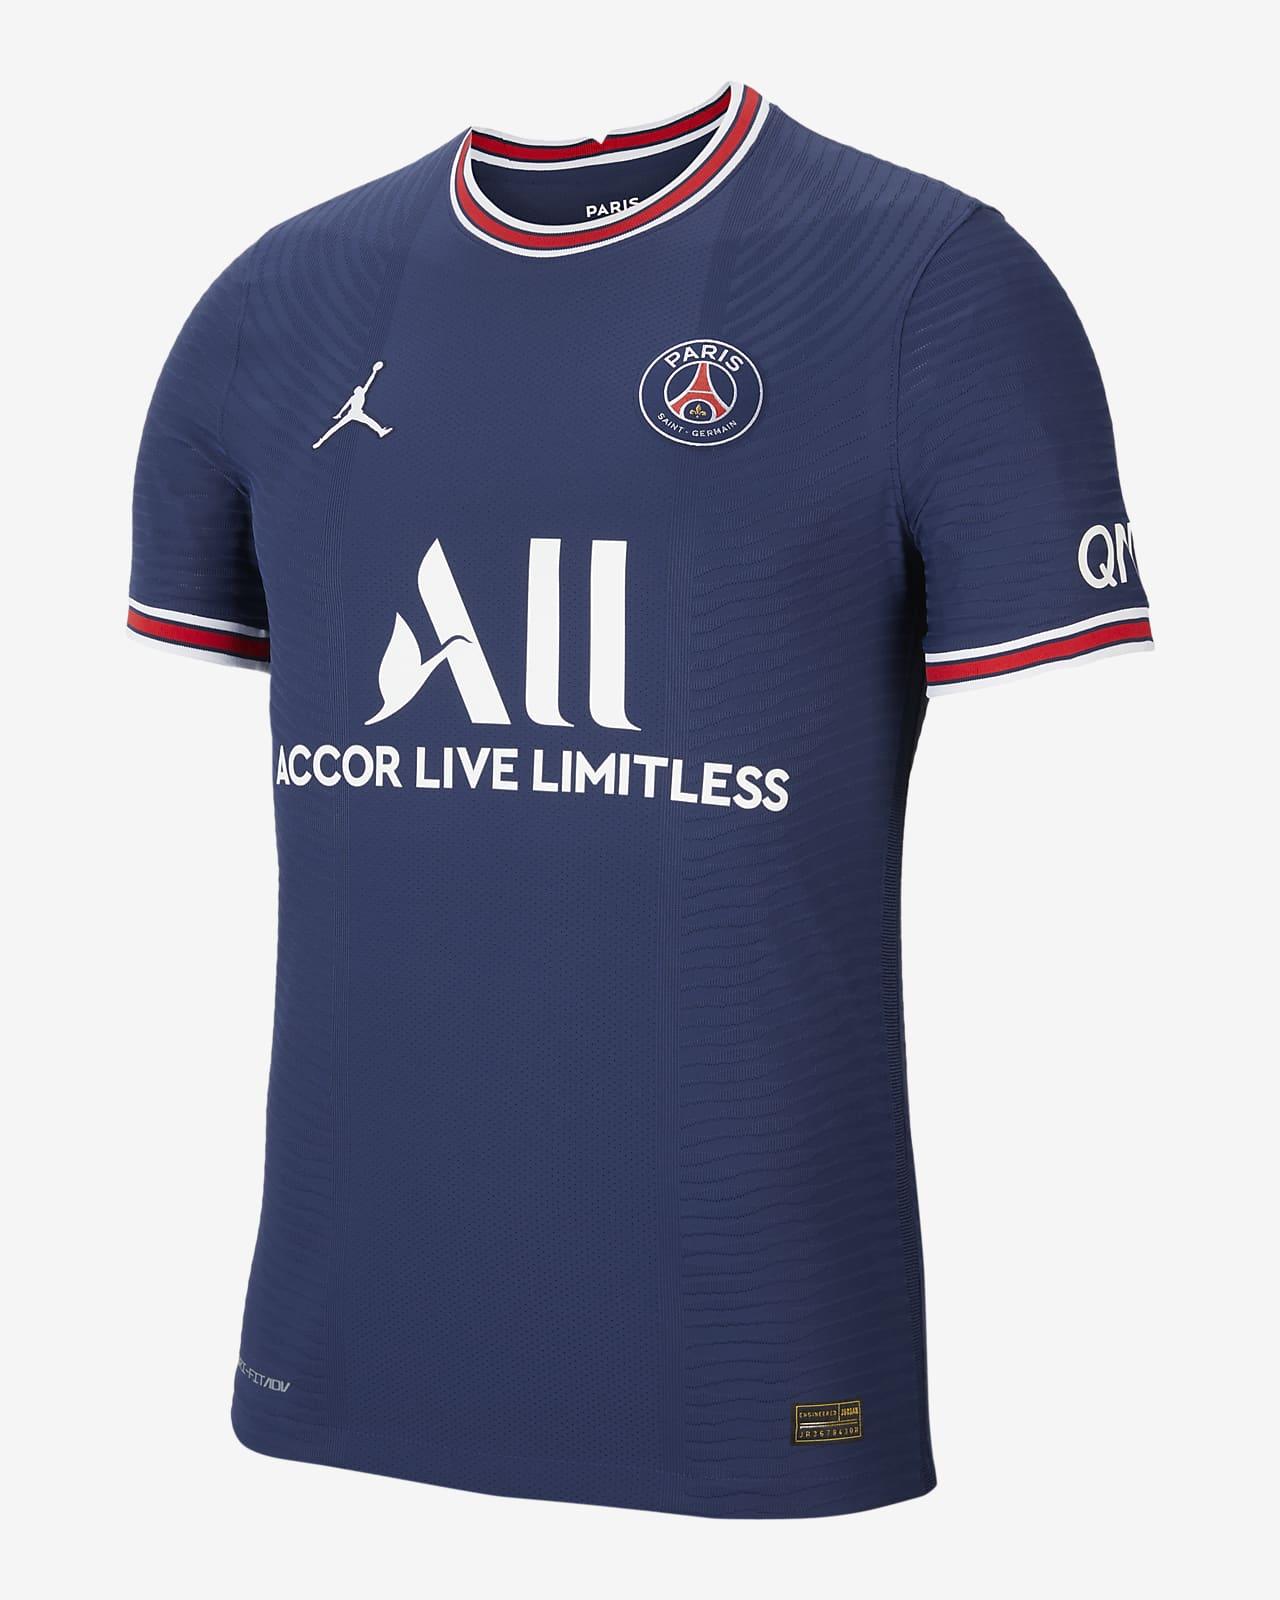 Jersey de fútbol Nike Dri-FIT ADV del Paris Saint-Germain local 2021/22 Match para hombre